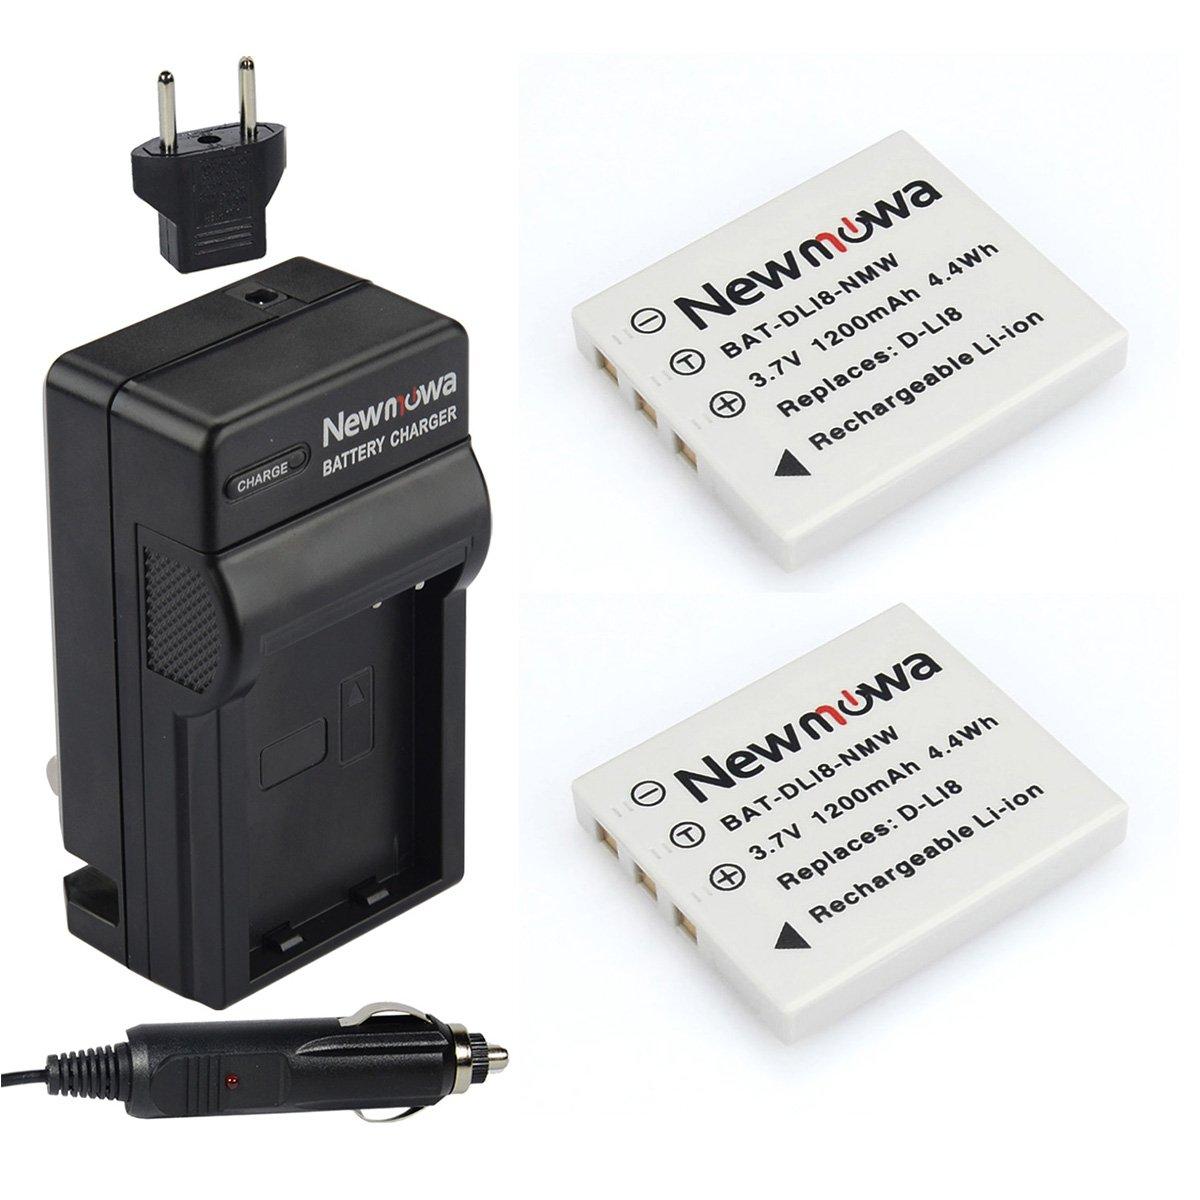 Newmowa Battery 2 Pack Charger Pentax